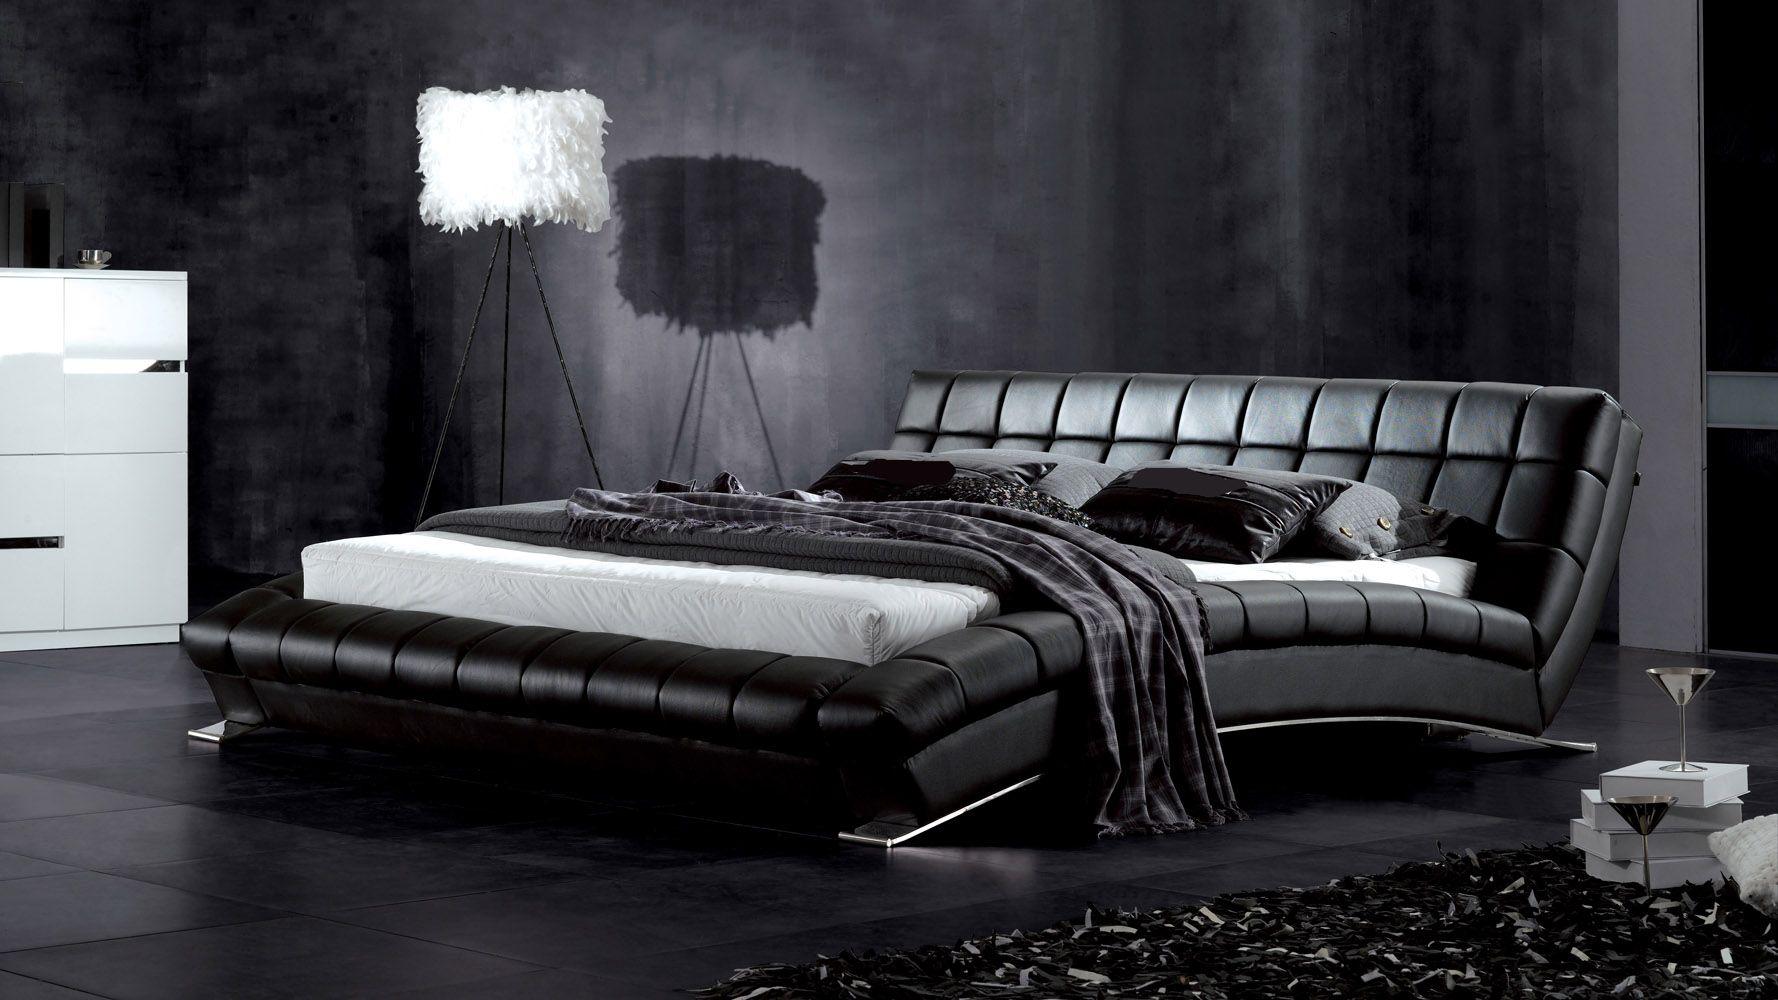 Black Leder Plattform Rahmen Schlafzimmer Design Holz Weiss Faux